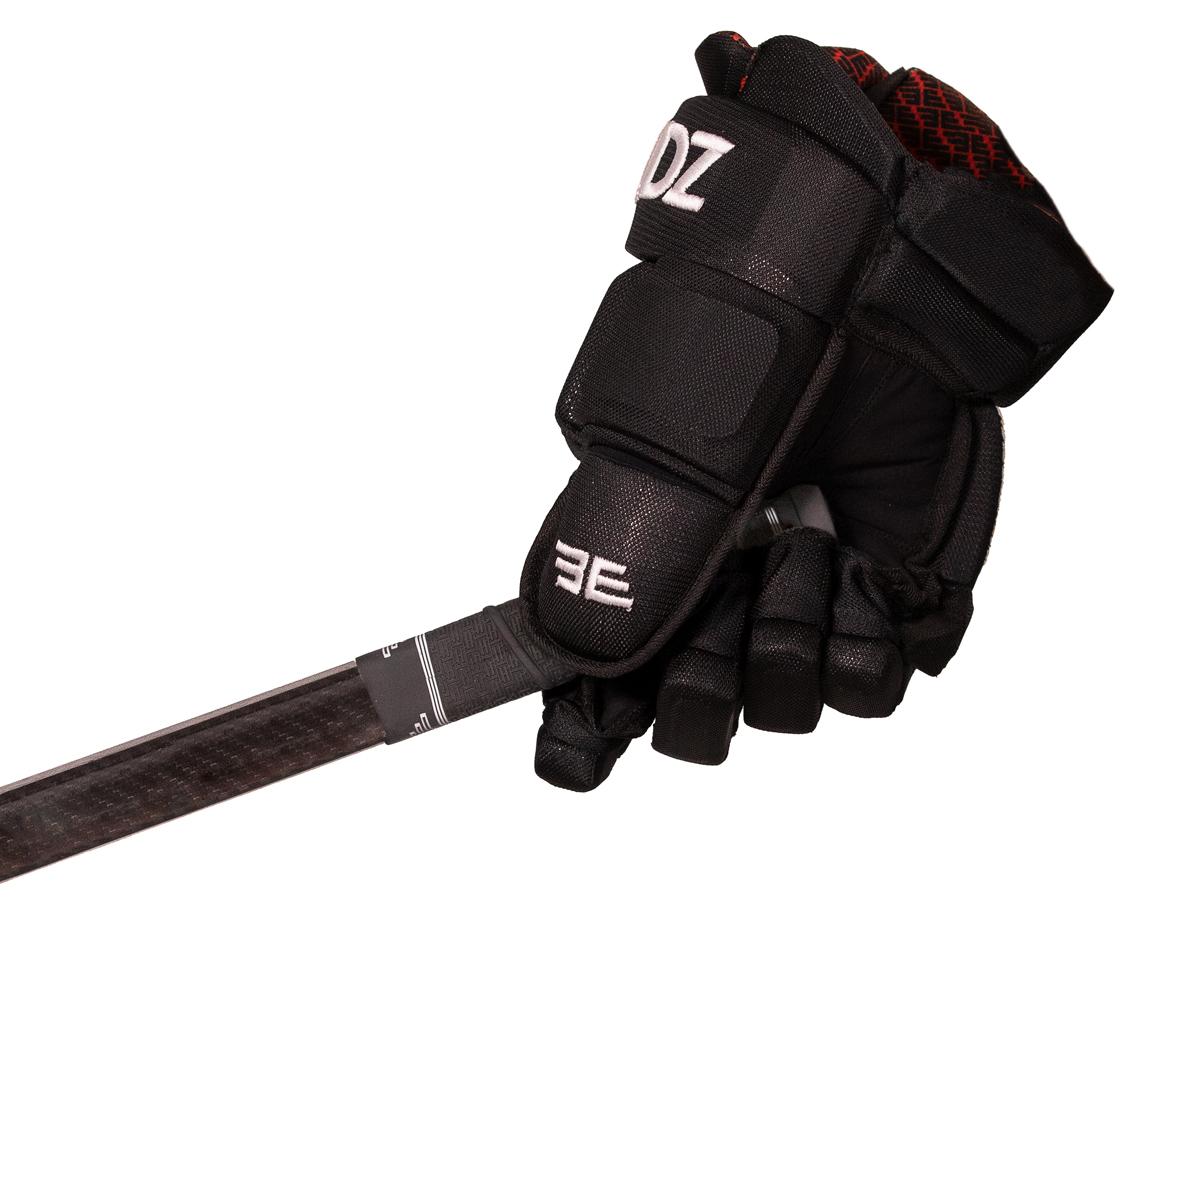 BUTT-Future-Black-Glove-Right-02-WHITE-WEB.jpg